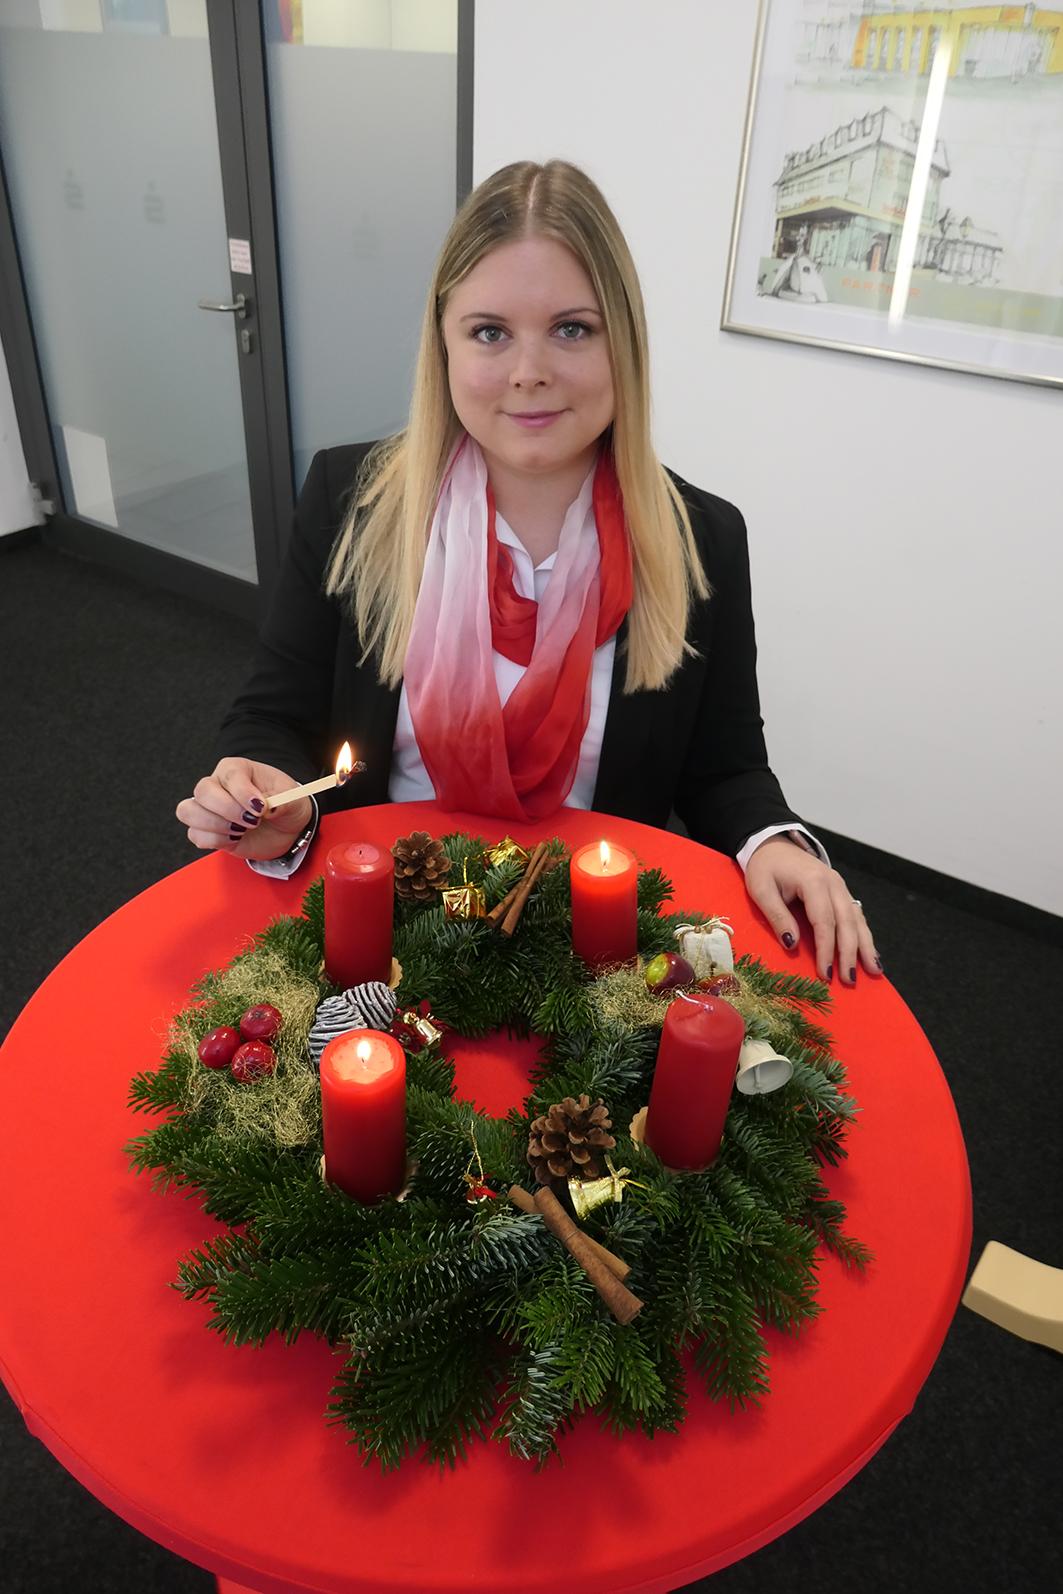 2020-12-14-HA-Haslach-Unternehmen-Sparkasse-Adventsaktion-Lisa Ahrens